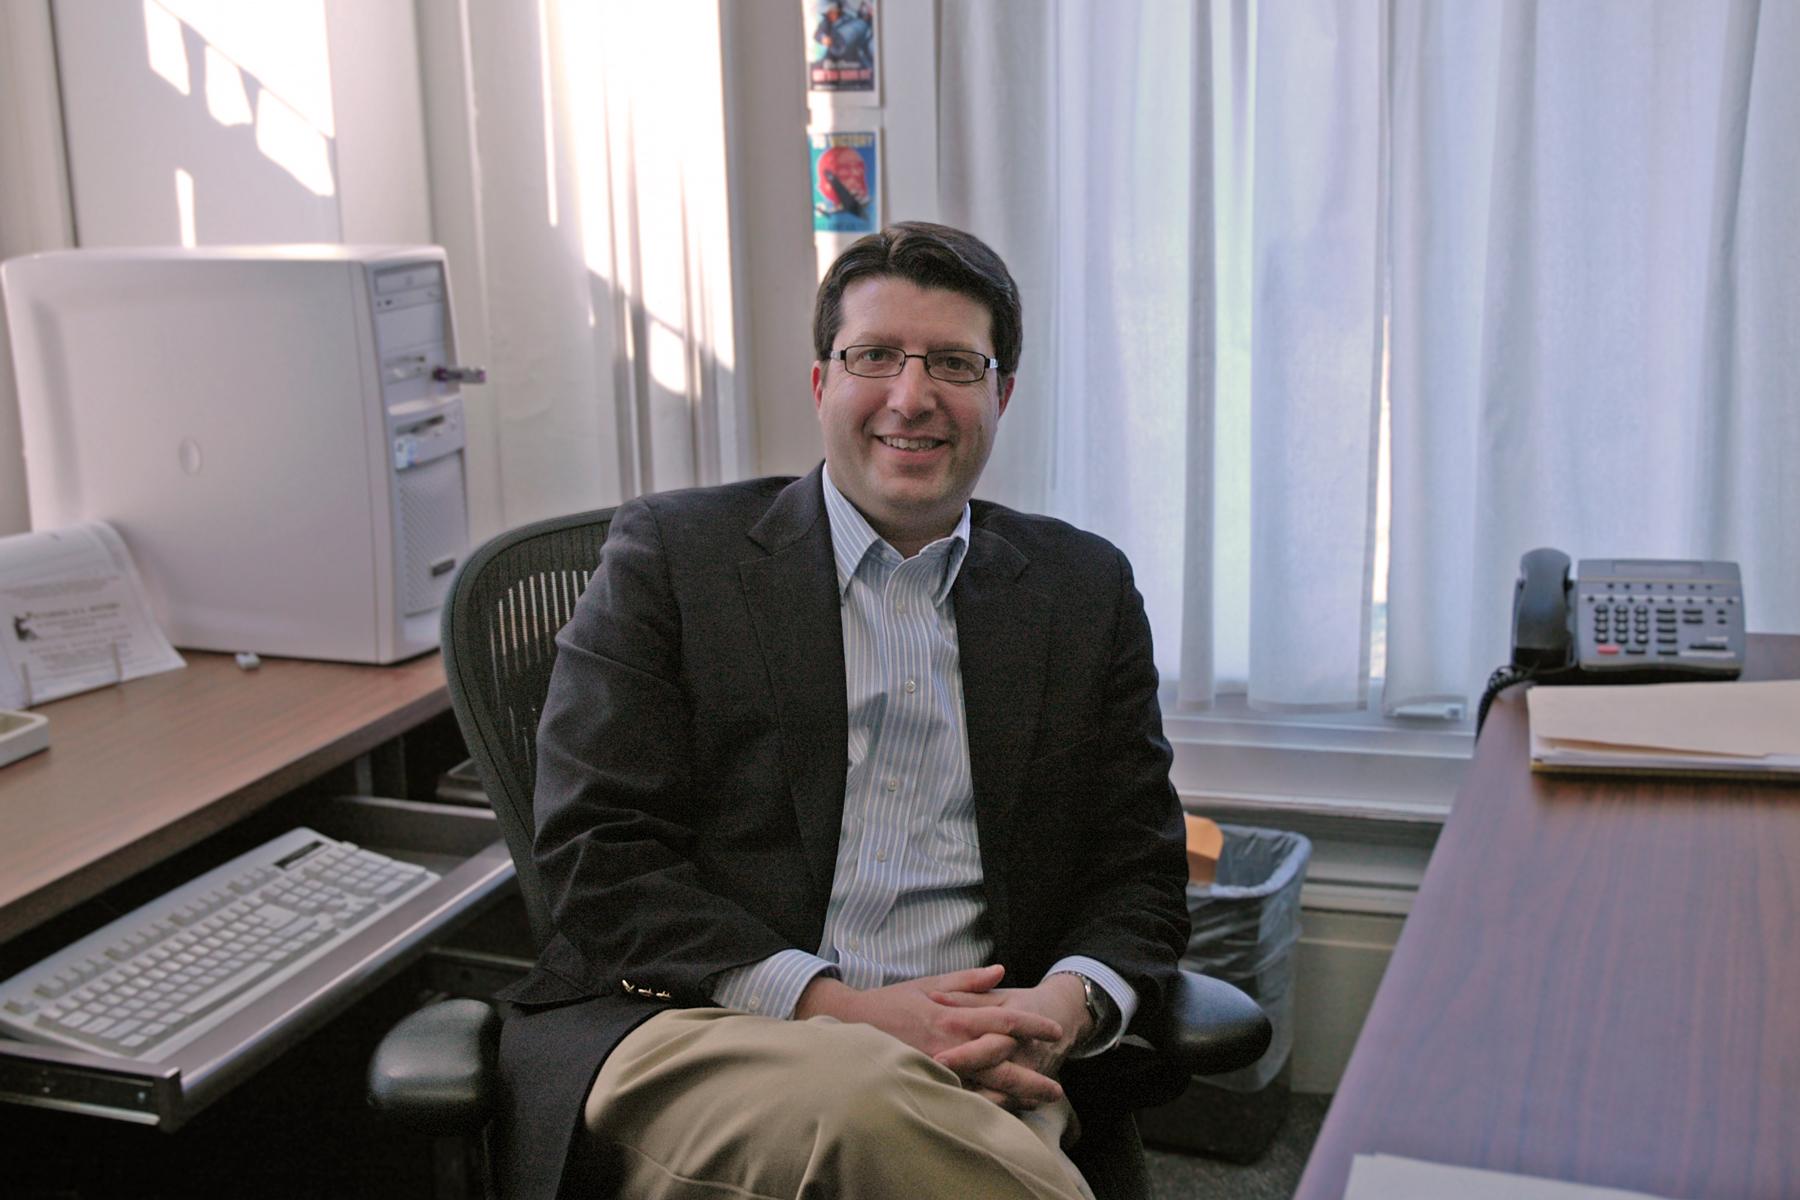 Professor of History, Dr. Michael Flamm